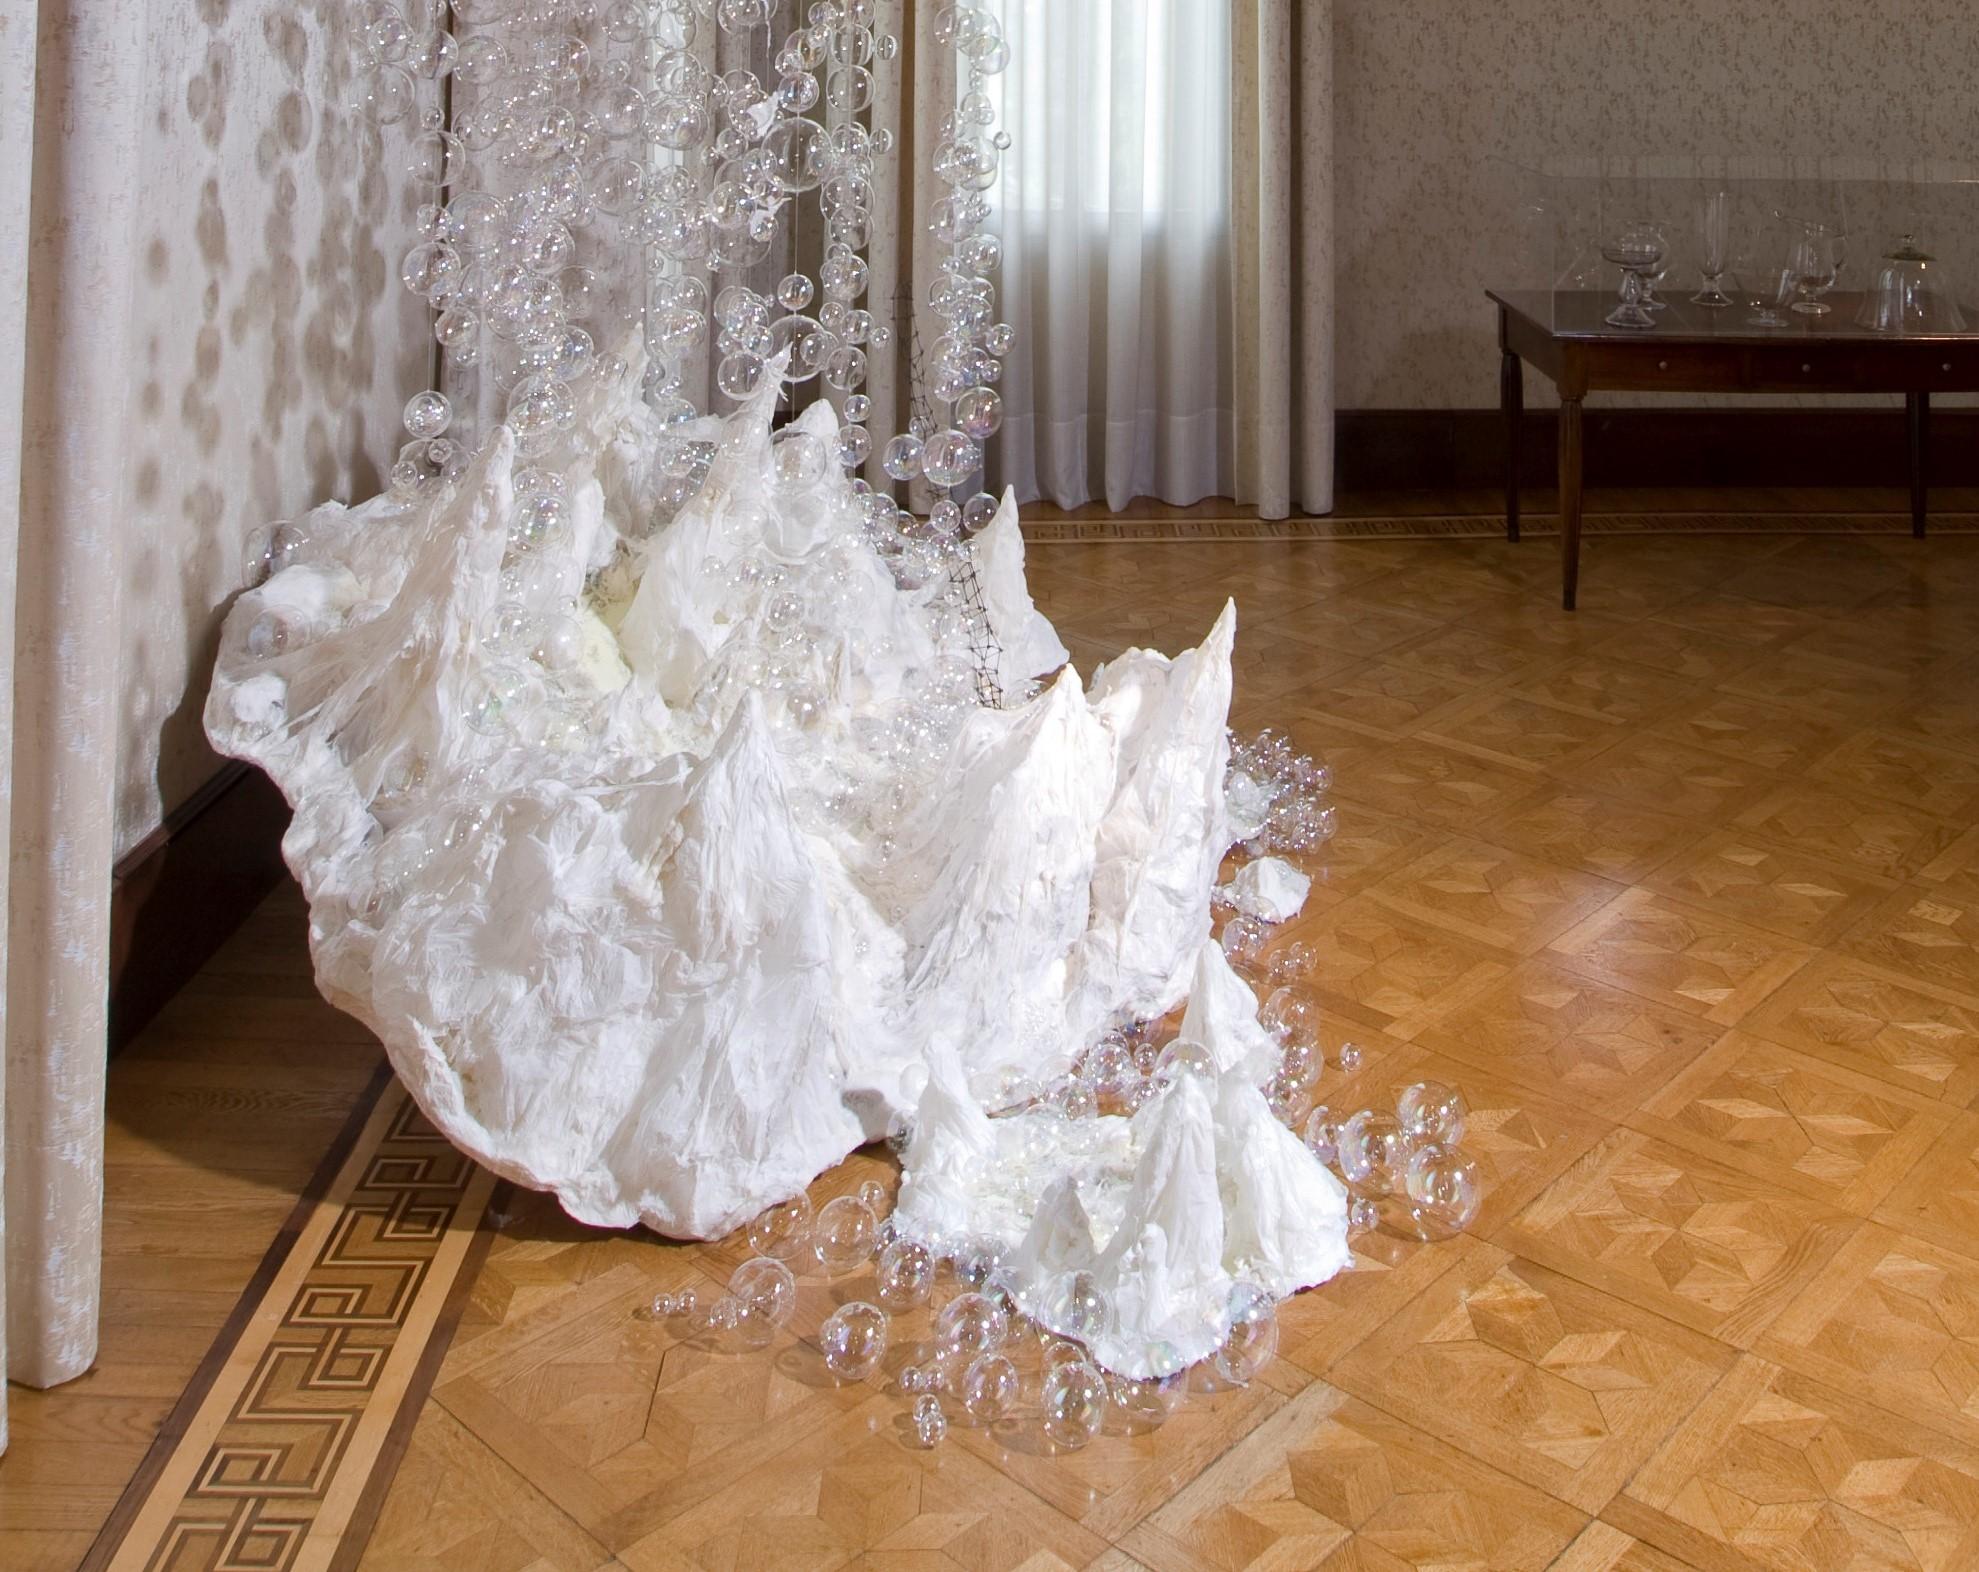 Marya Kazoun's Habitat: Where He Came From